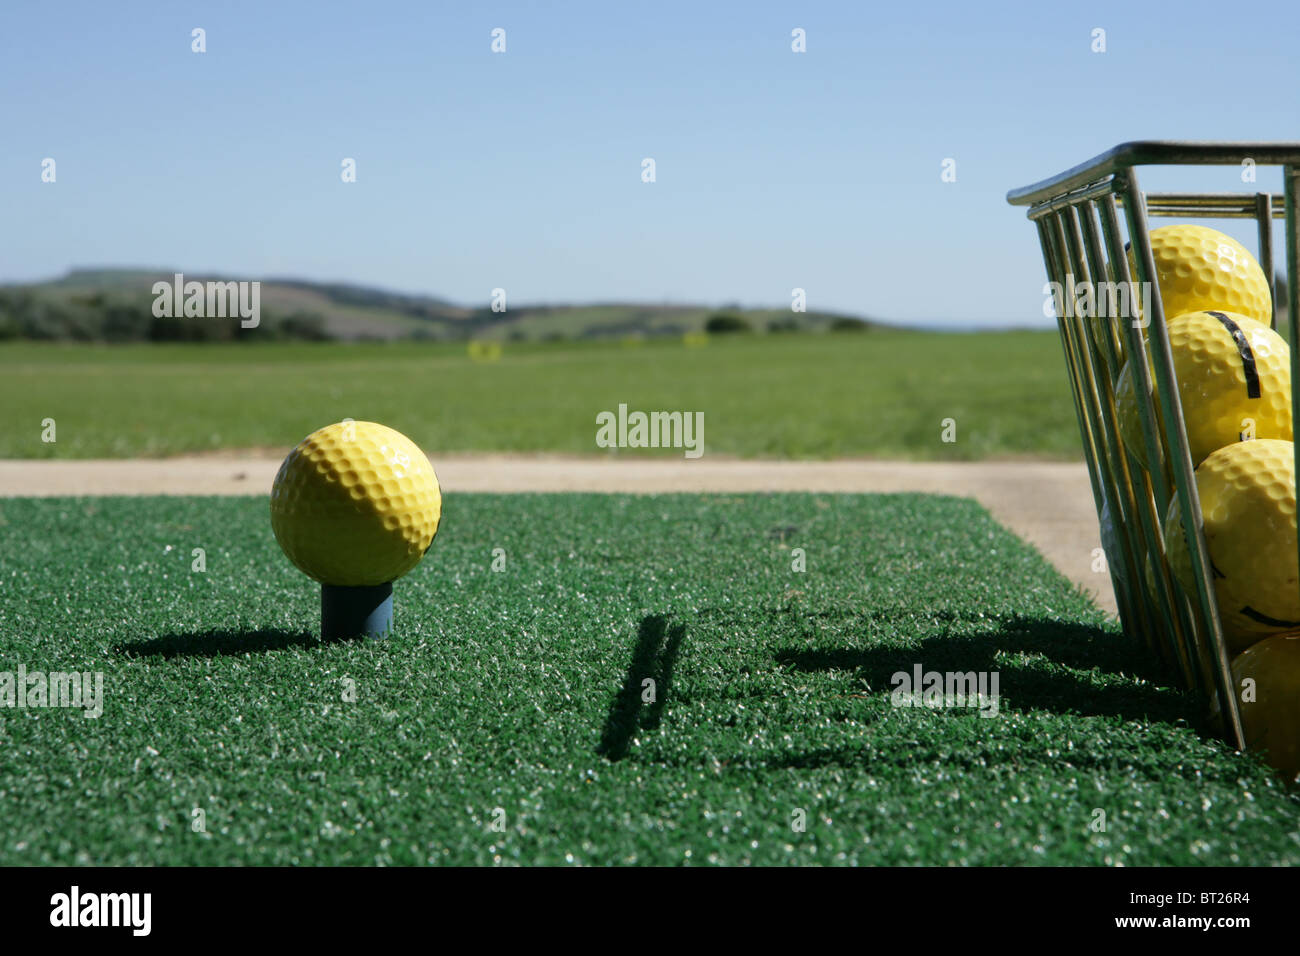 Golf ball and bucket at driving range - Stock Image